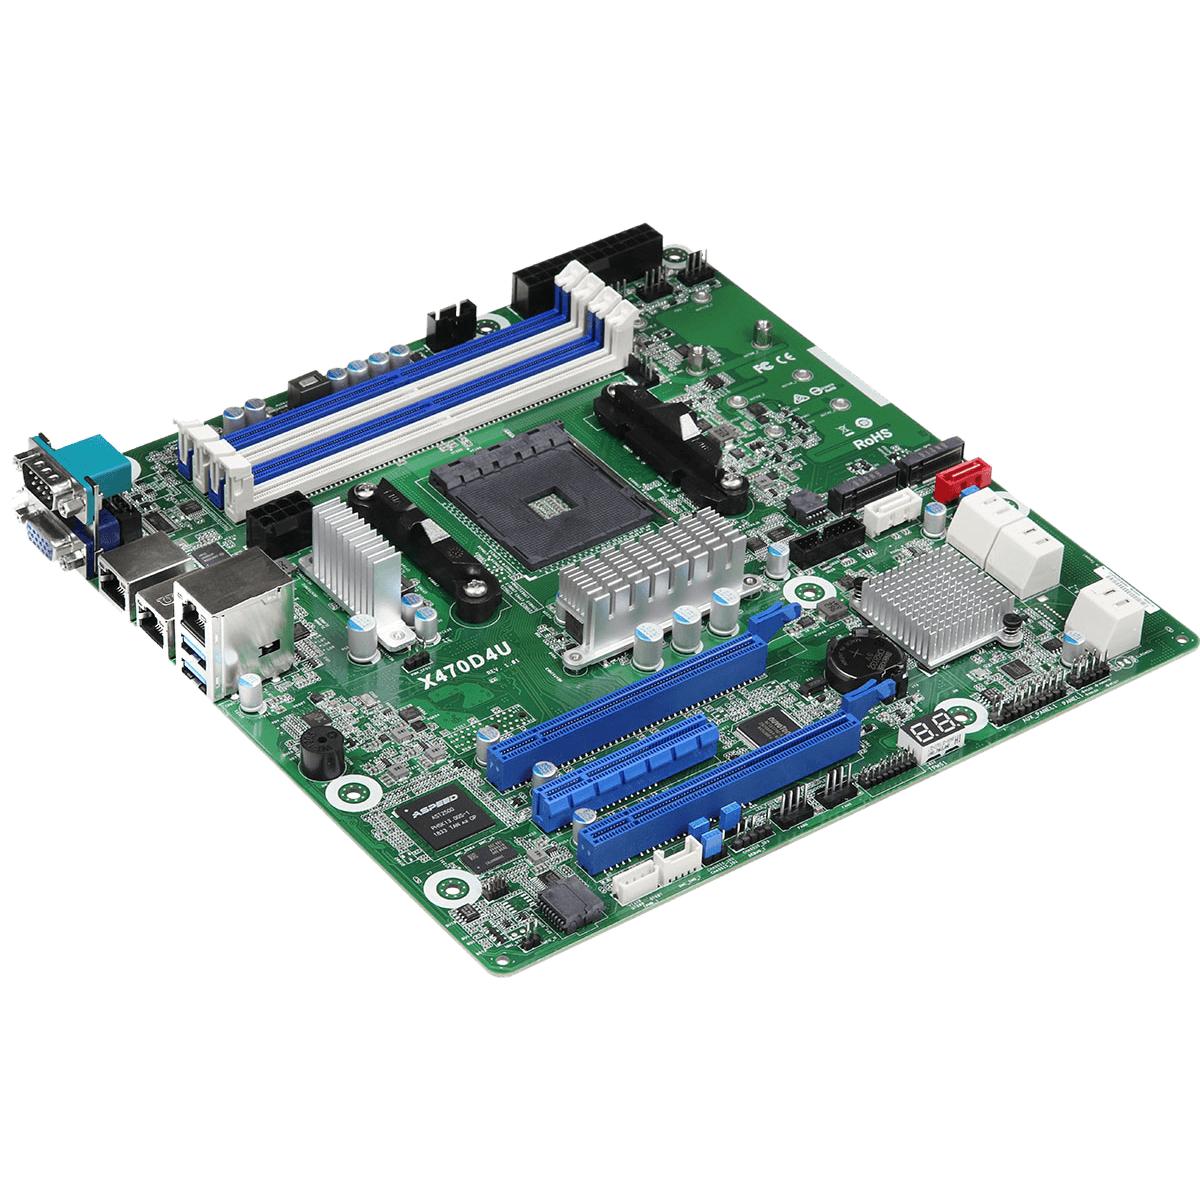 ASRock Rack X470D4U AMD AM4 µATX Mainboard für Ryzen Server